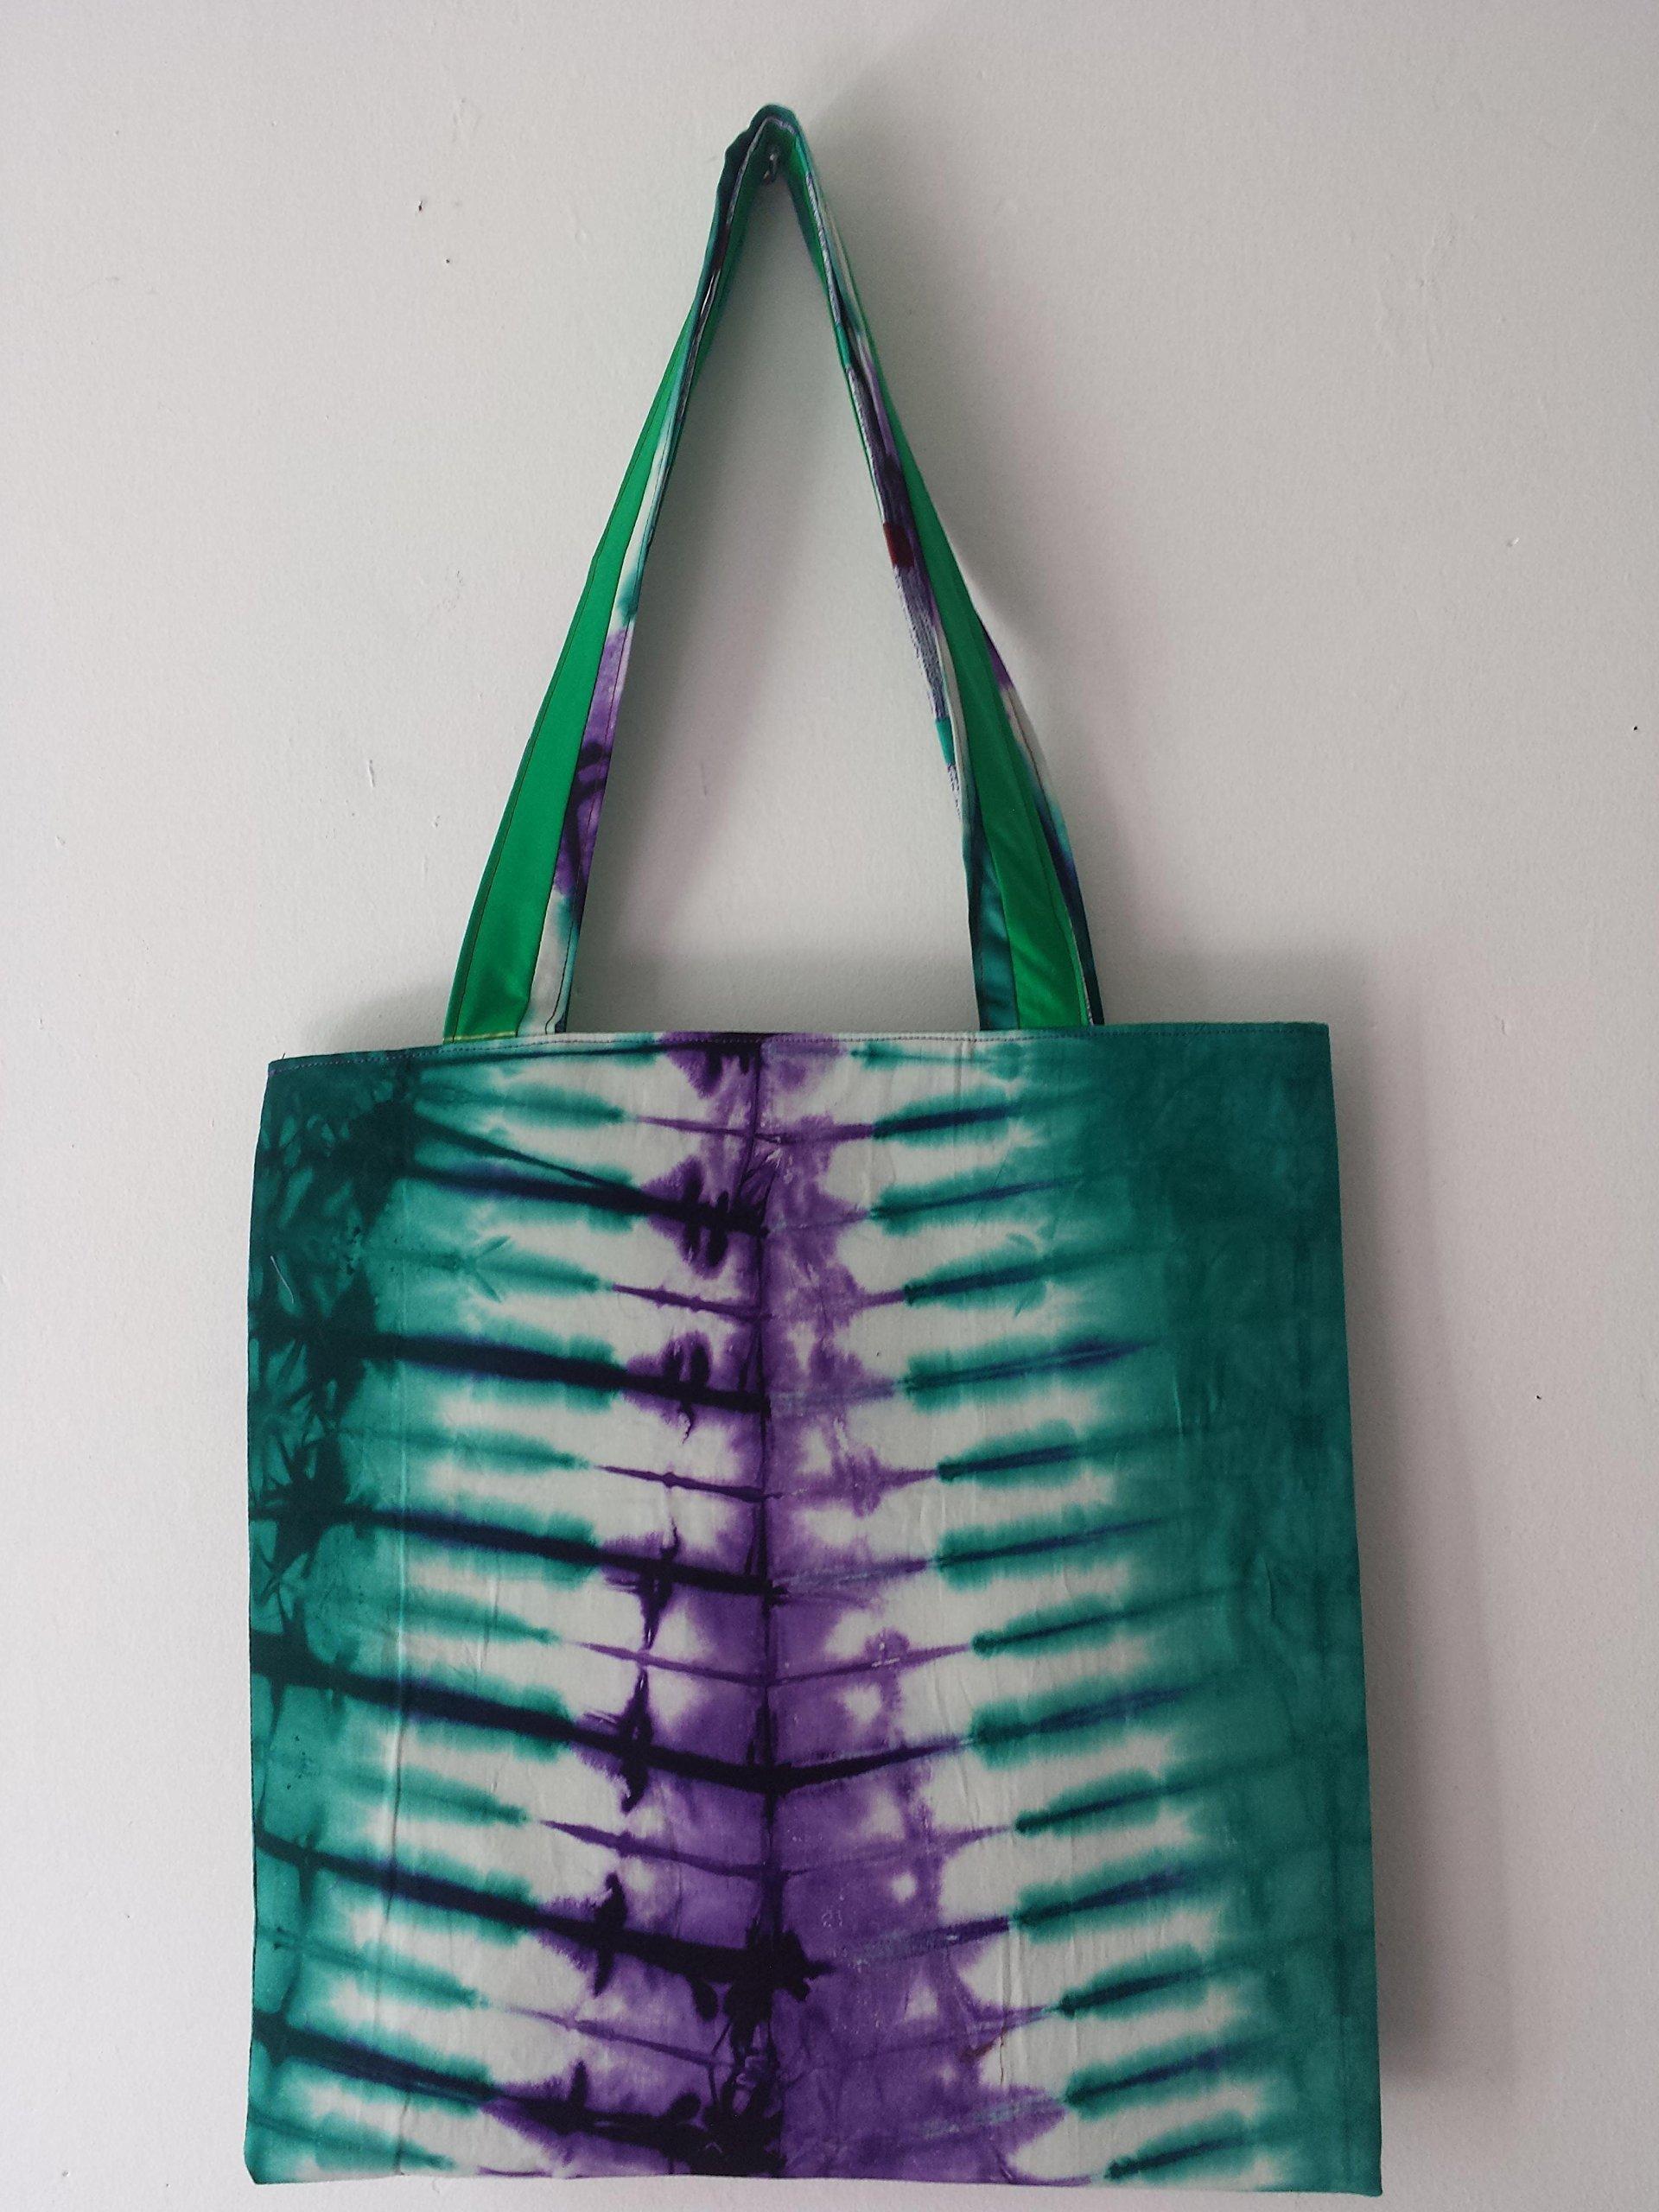 Traditional African Batik Tie dye Tote Shopper Bag - handmade-bags